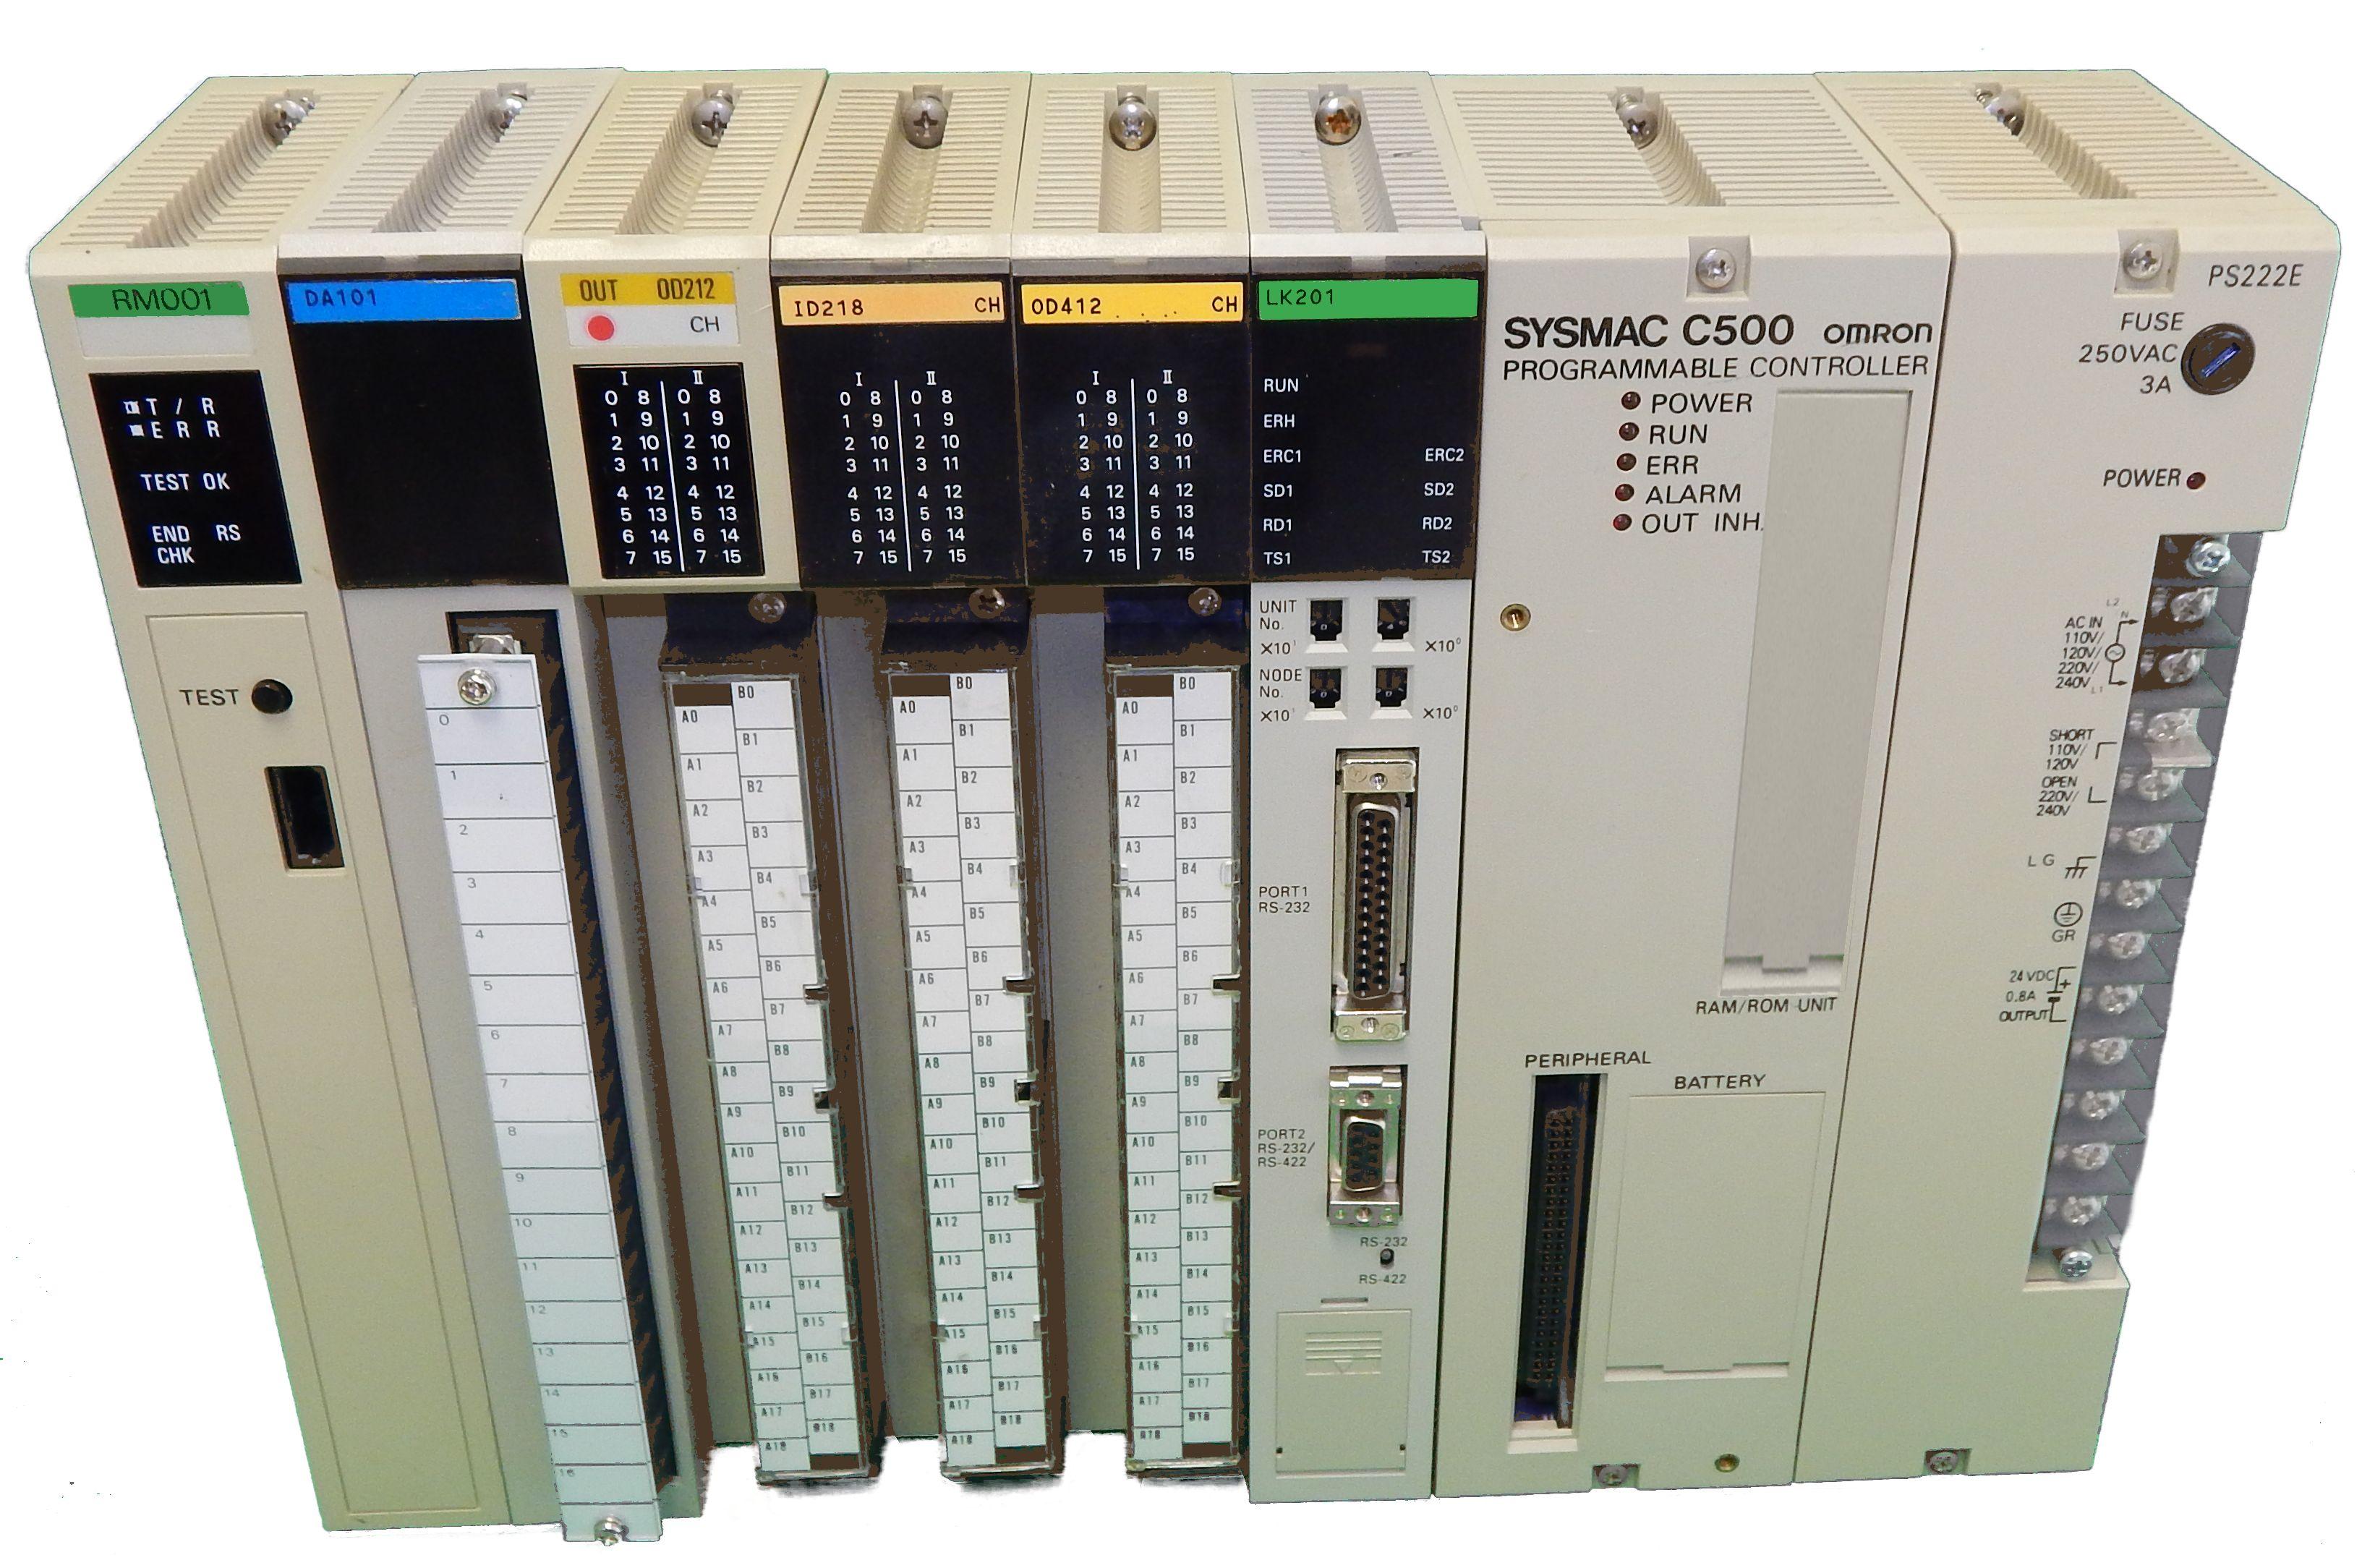 3G2C5-MR341-V2